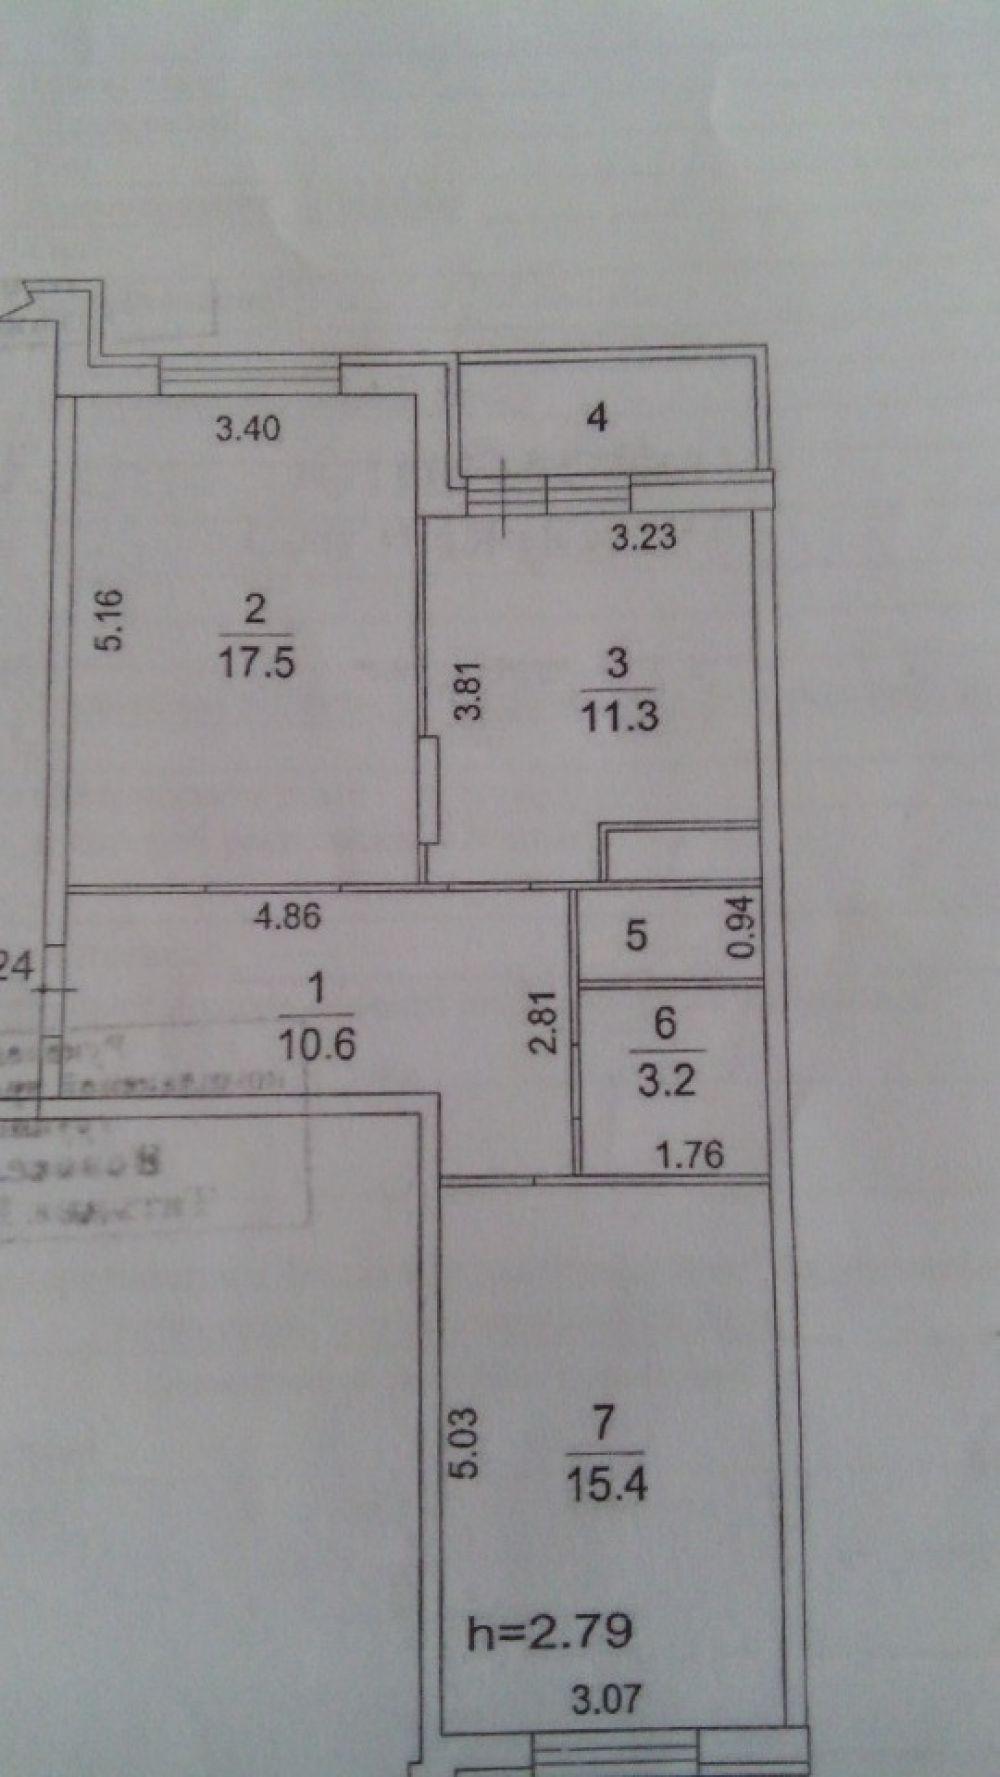 2-к квартира, Щелково, микрорайон Богородский, 6, фото 18